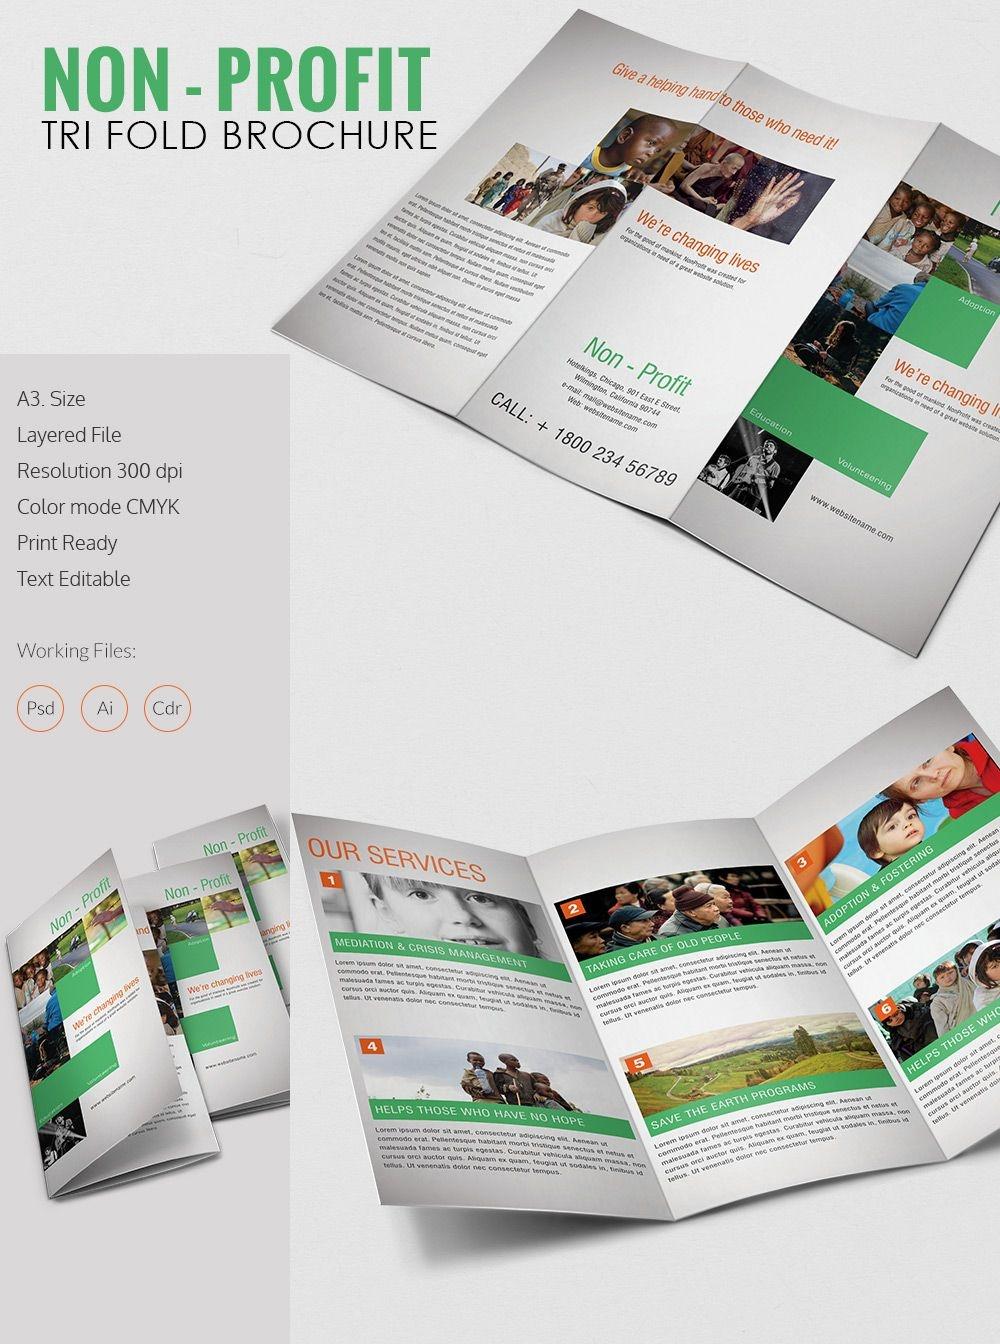 Tri Fold Brochure Template - 43+ Free Word, Pdf, Psd, Eps, Indesign - Free Printable Brochure Maker Download